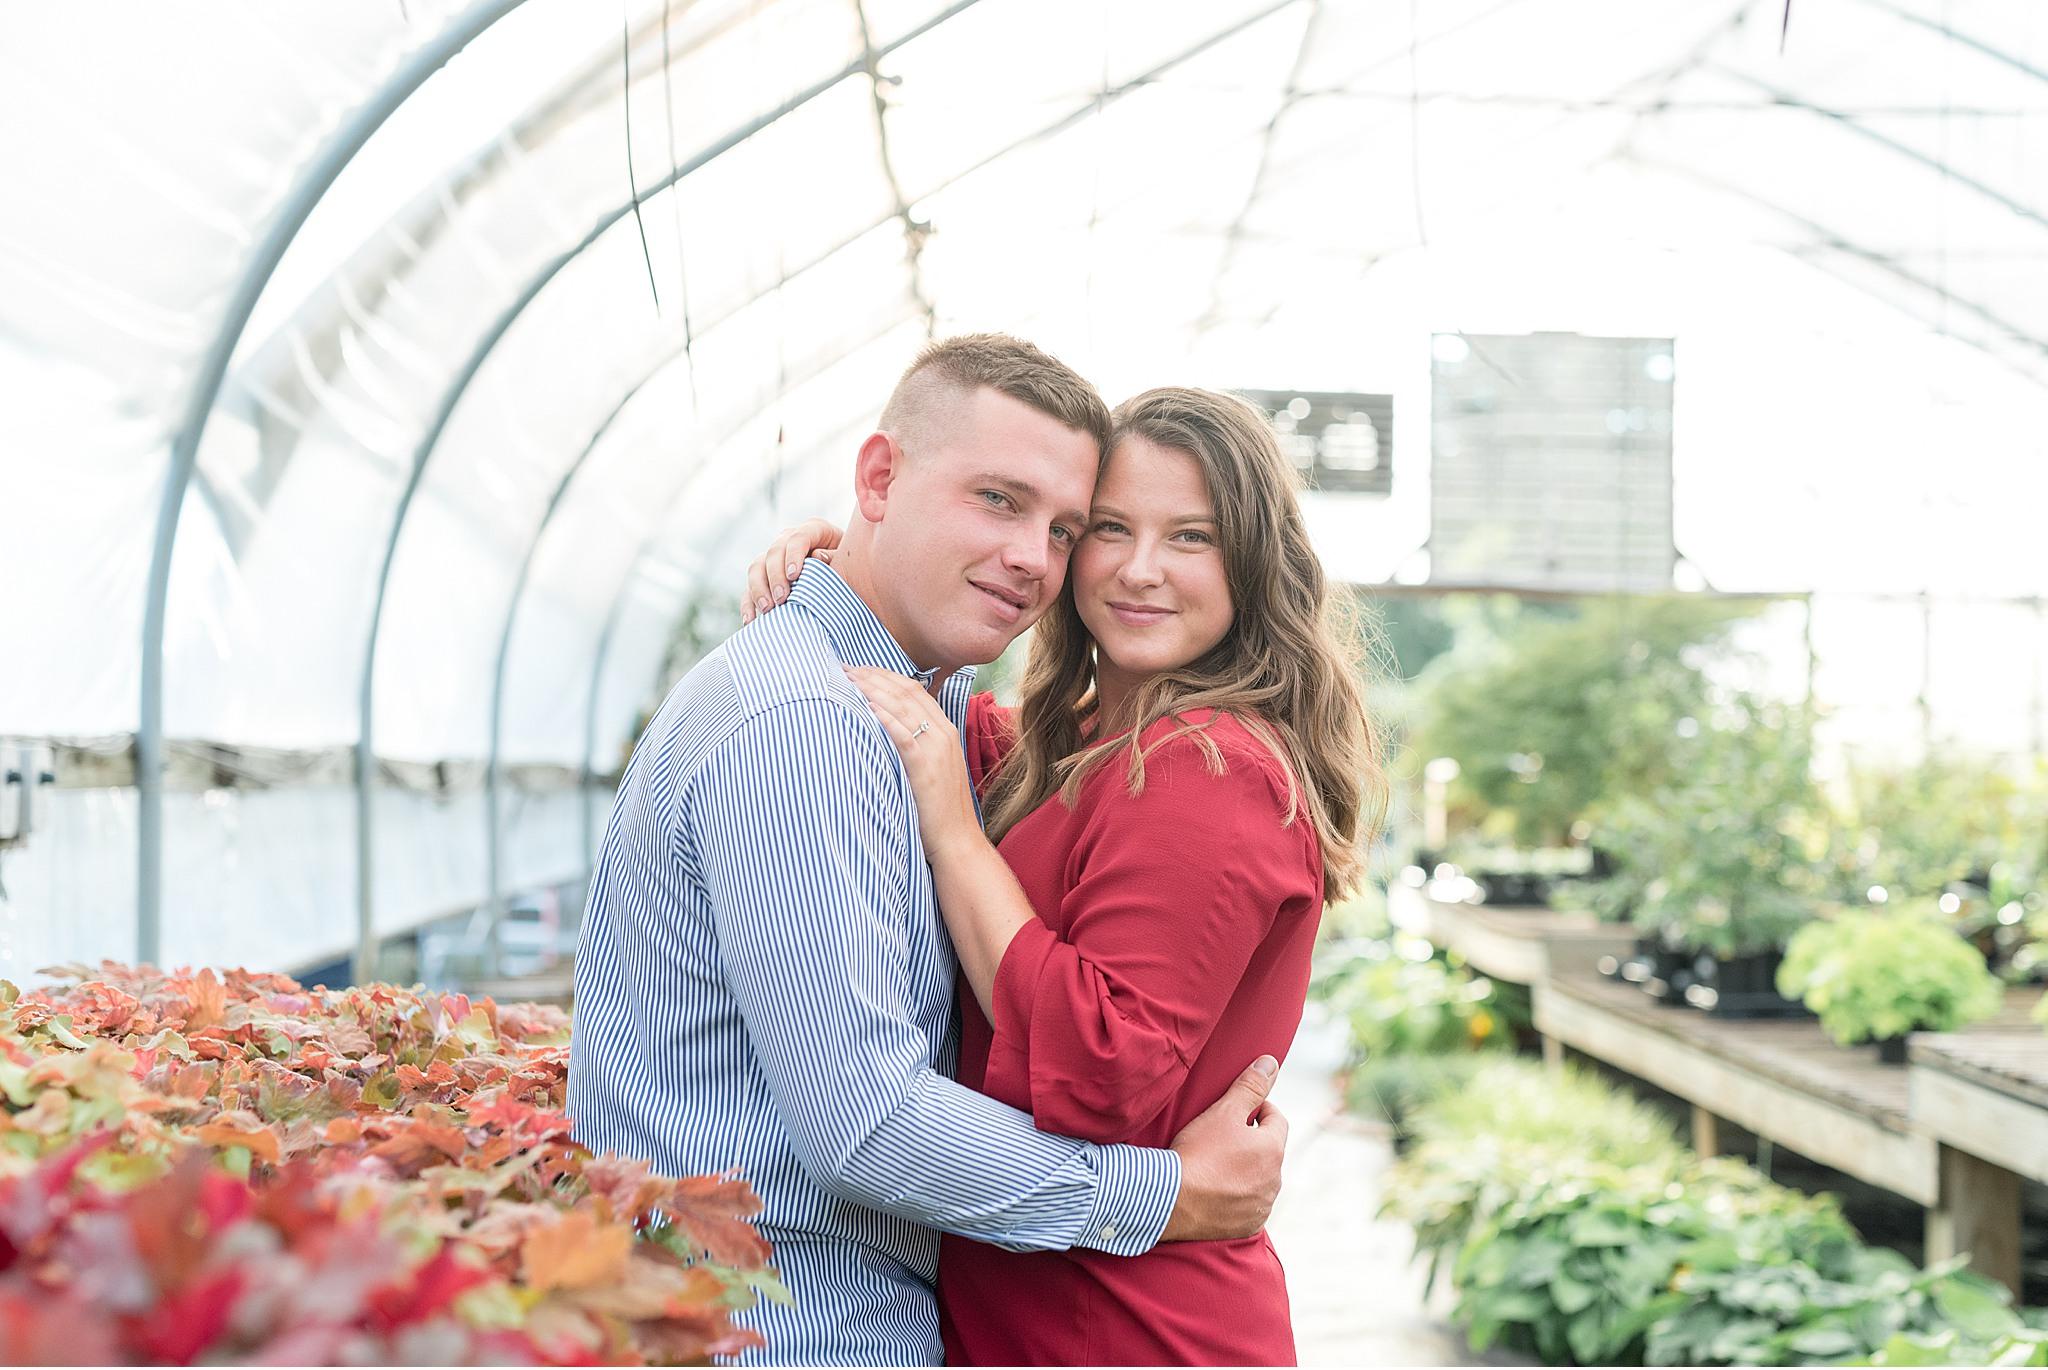 Tudbinks Greenhouse Lancaster PA wedding engagement photography_3970.jpg